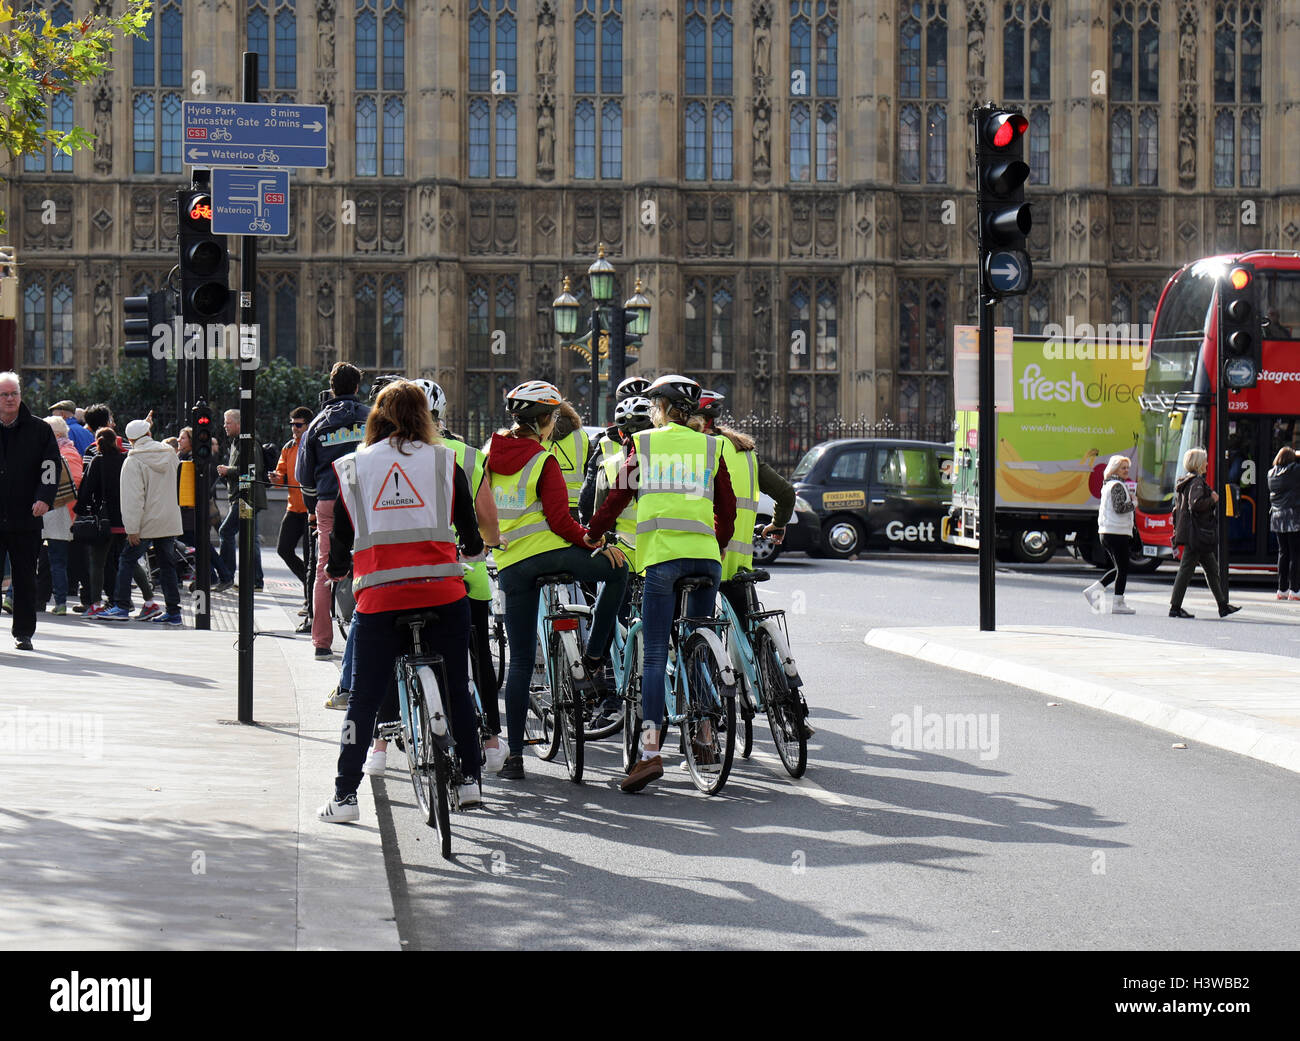 Cyclists using cycle lane traffic light segregated - Stock Image